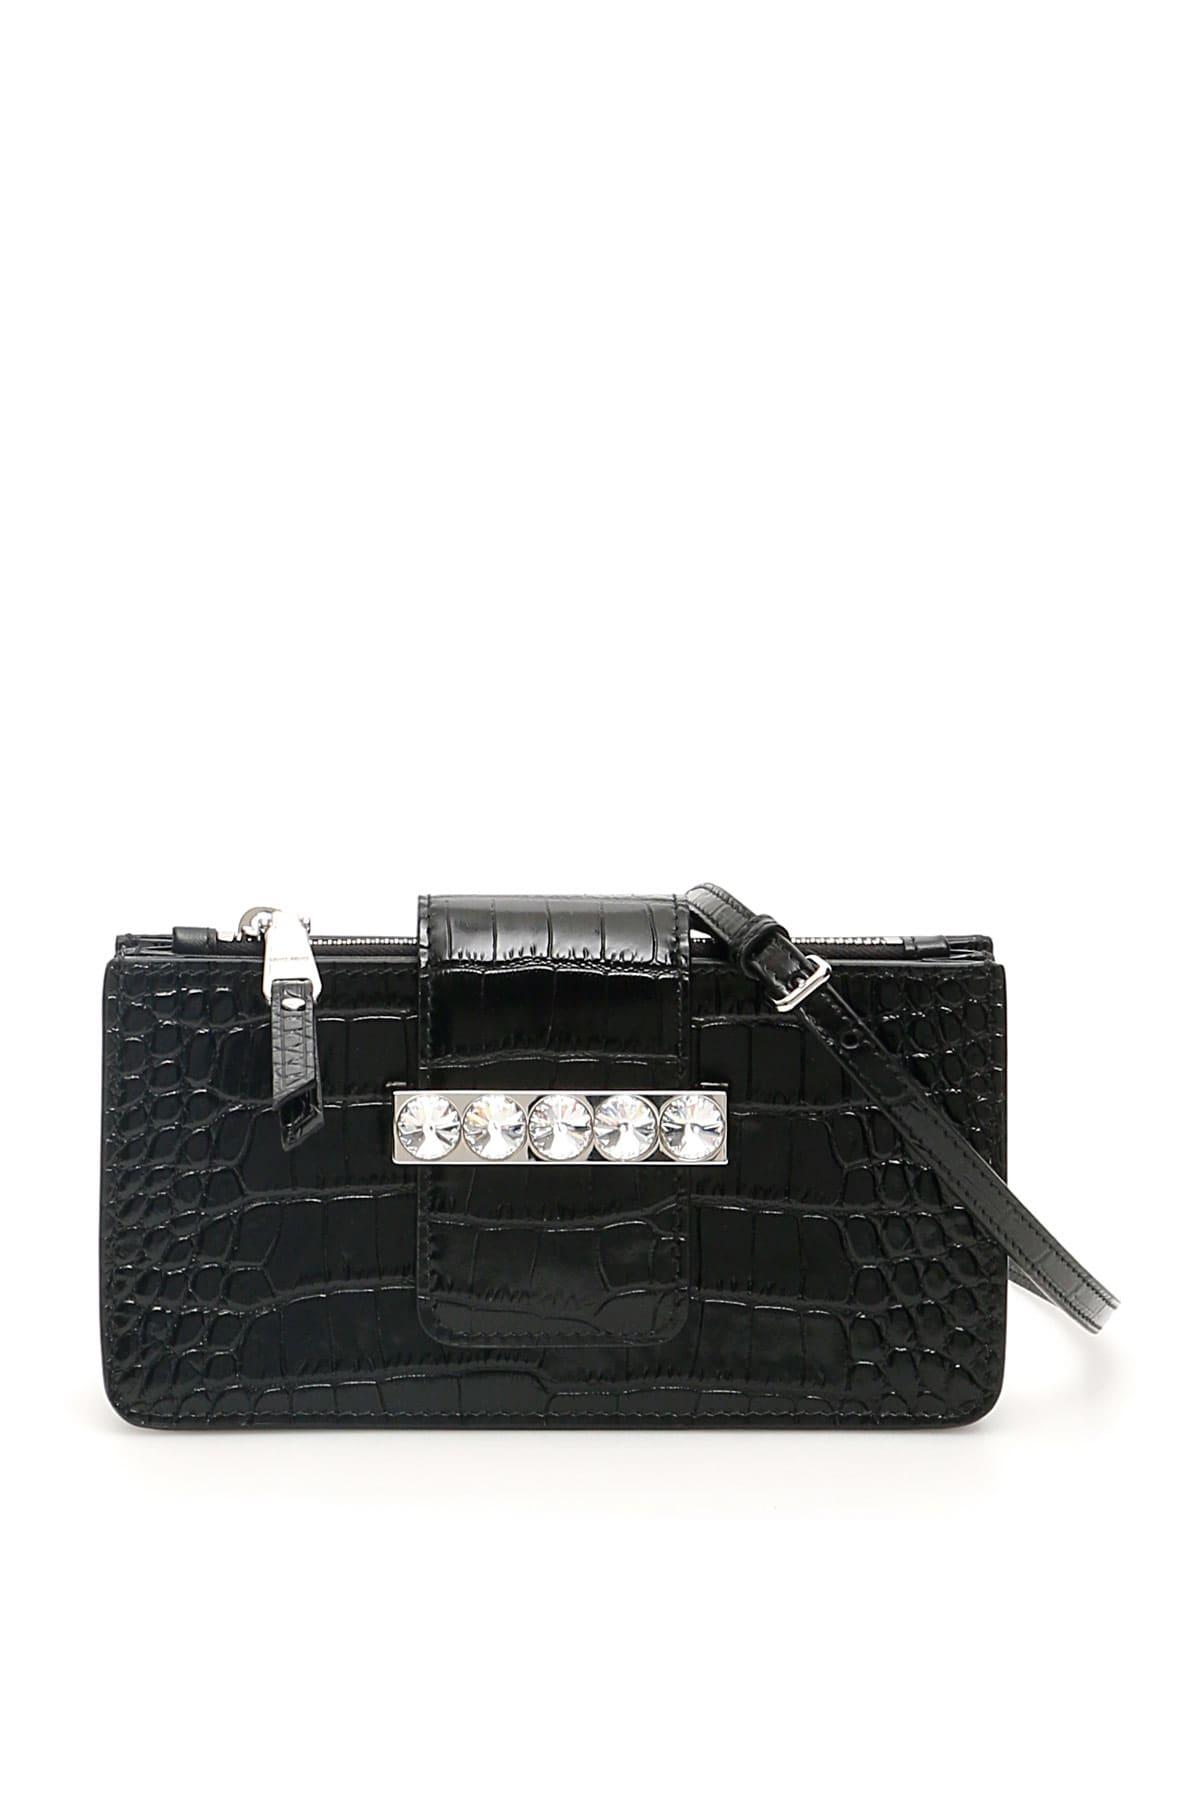 Miu Miu Crystal Mini Bag